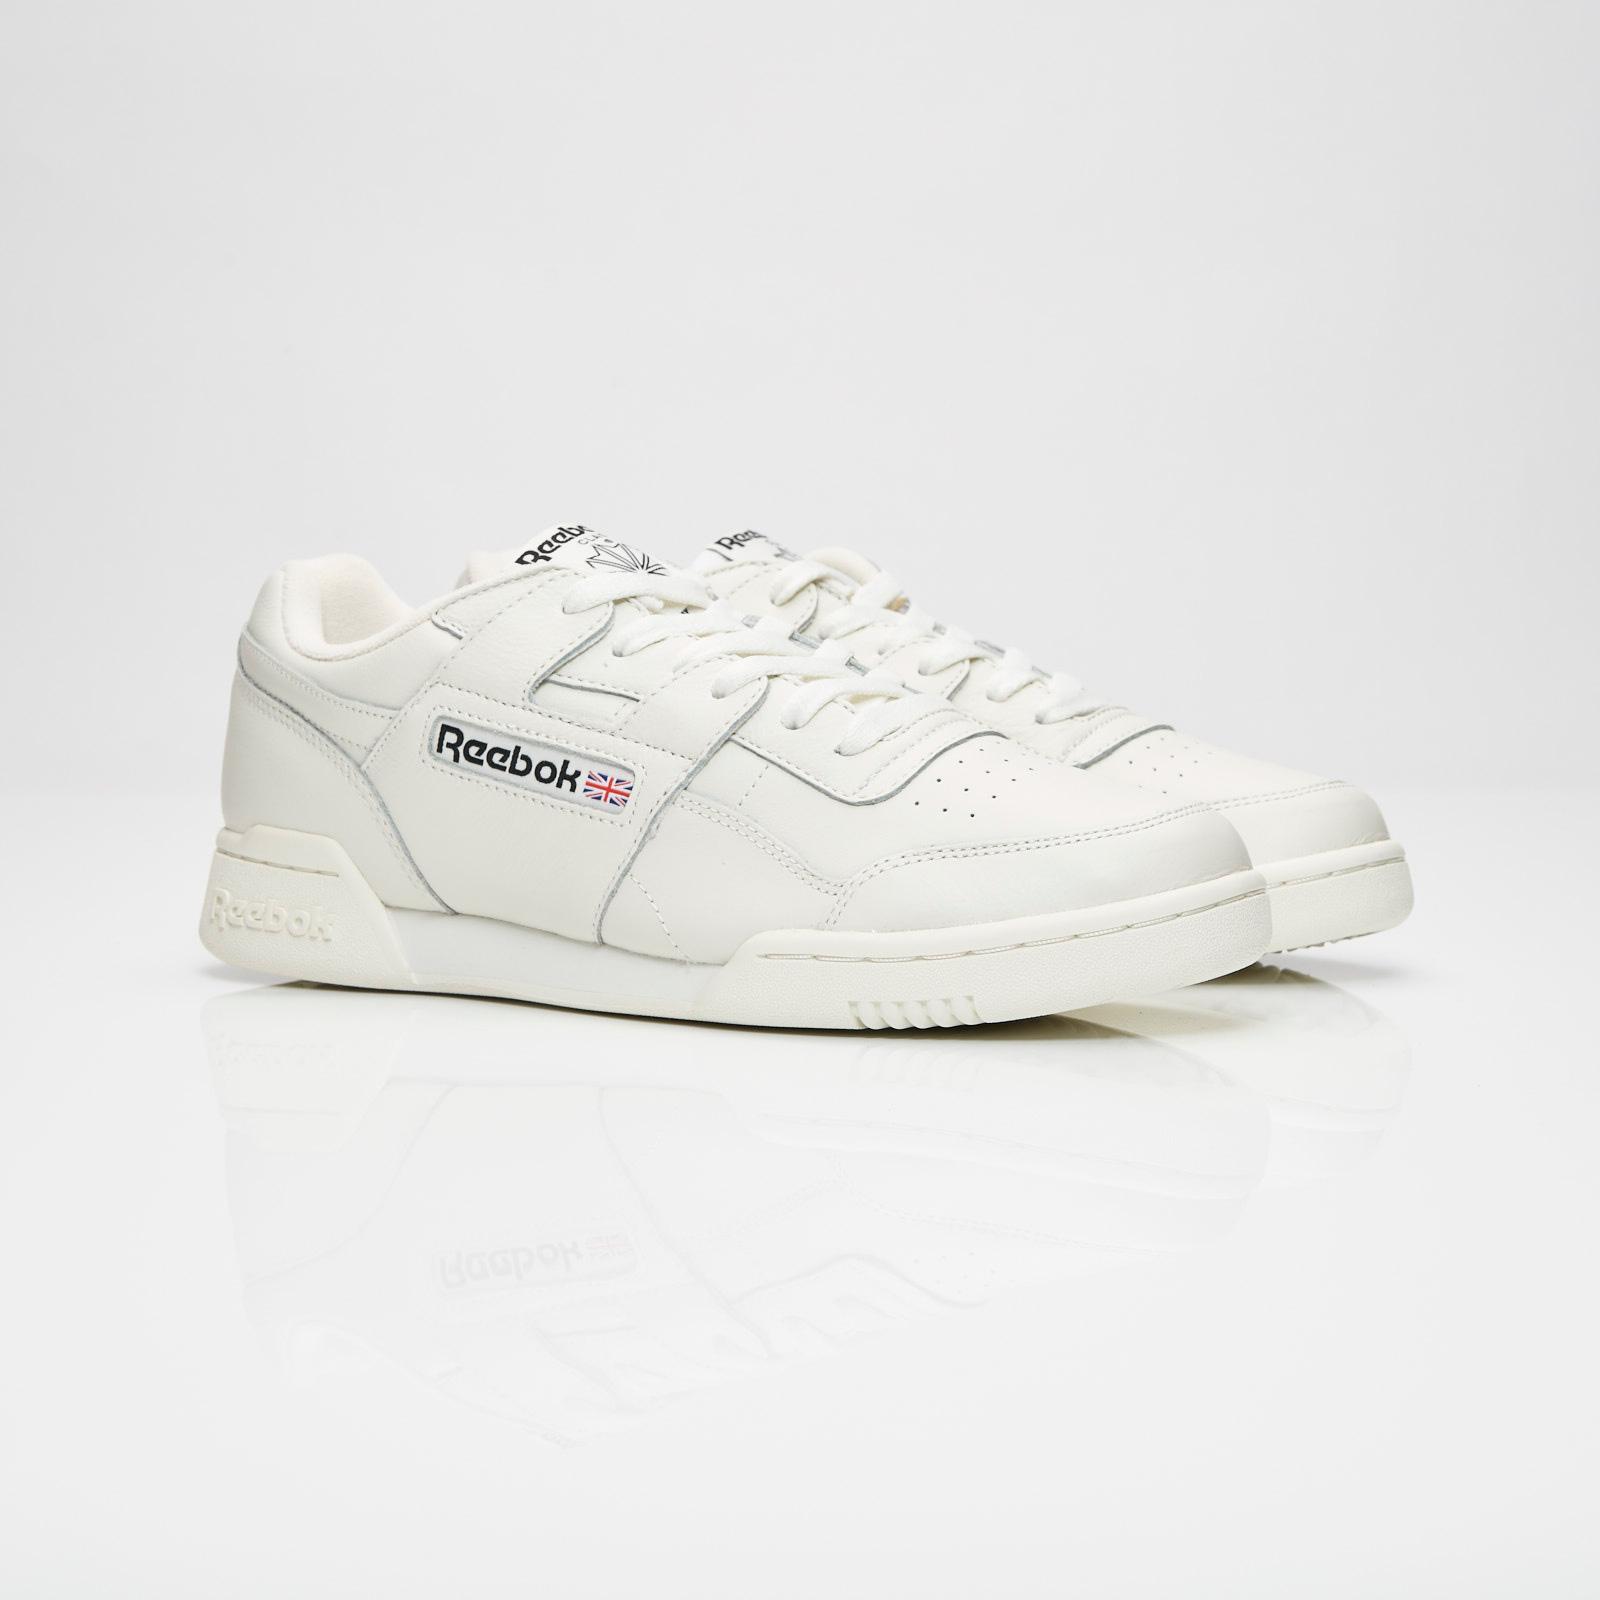 bd08c326875c2 Reebok Workout Plus MU - Cn4966 - Sneakersnstuff